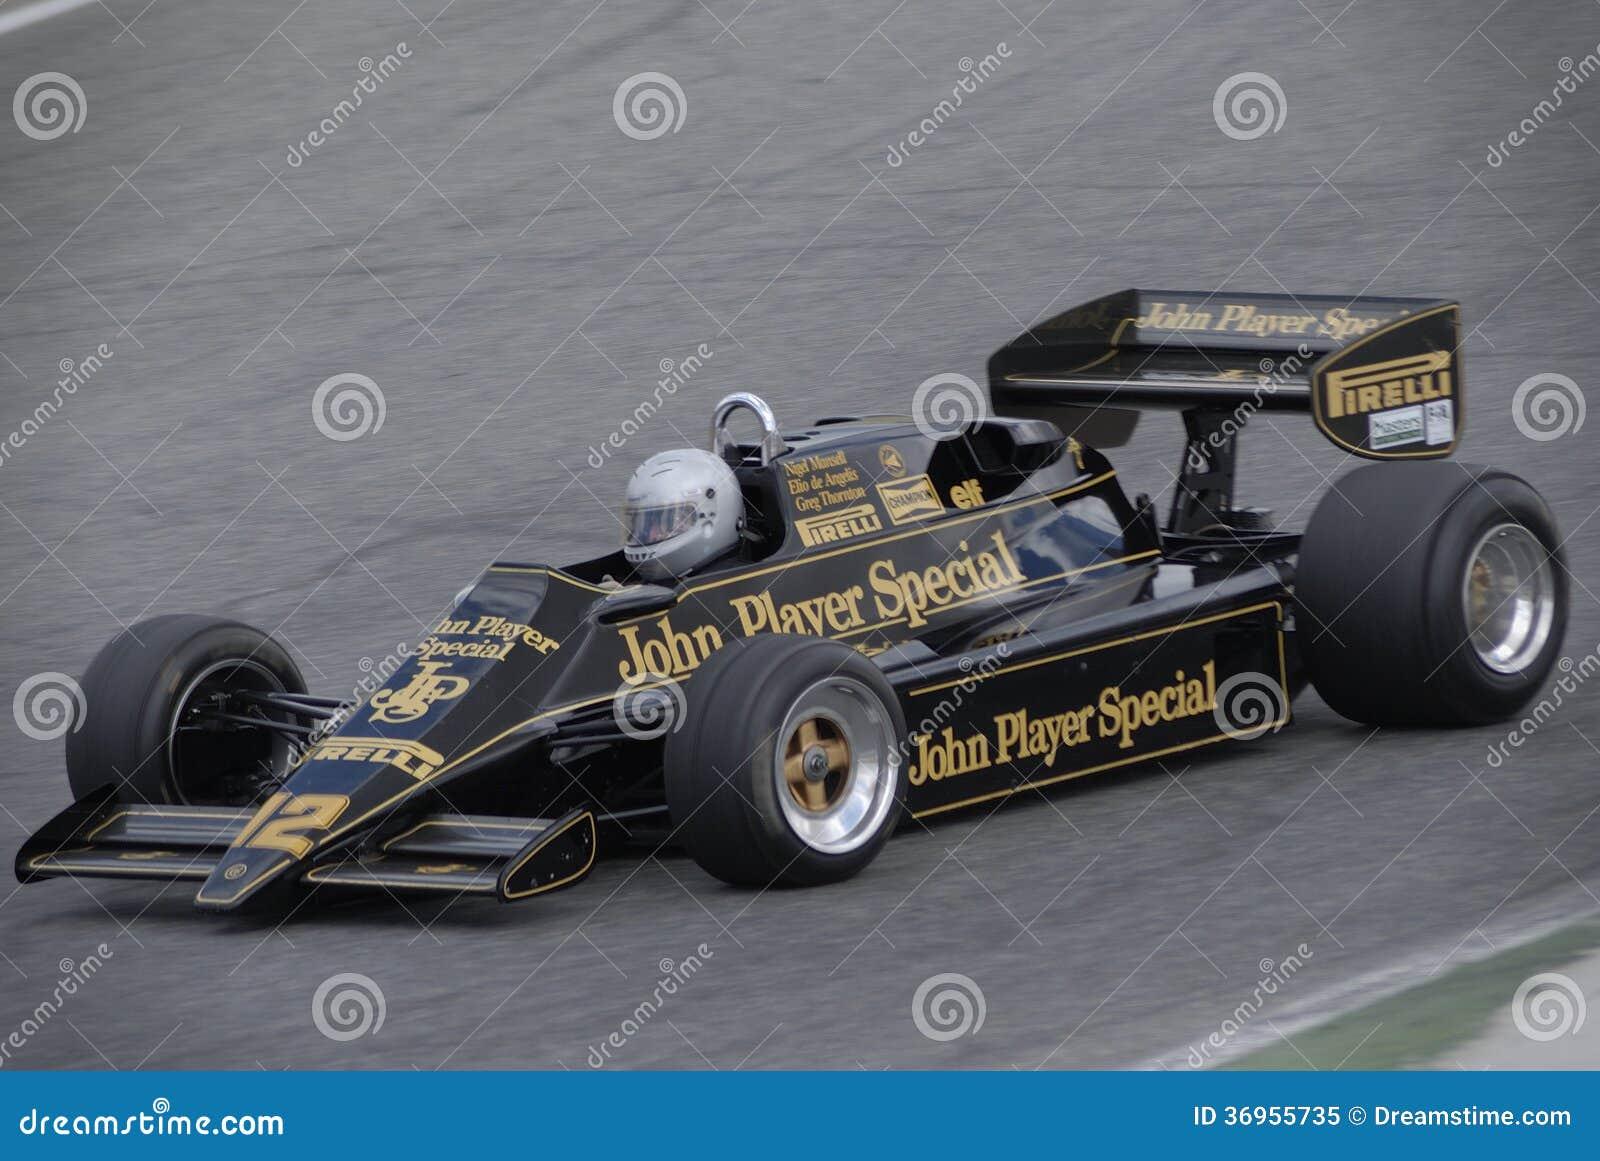 Lotus Jsp Formula One Mansell De Angelis Thornton